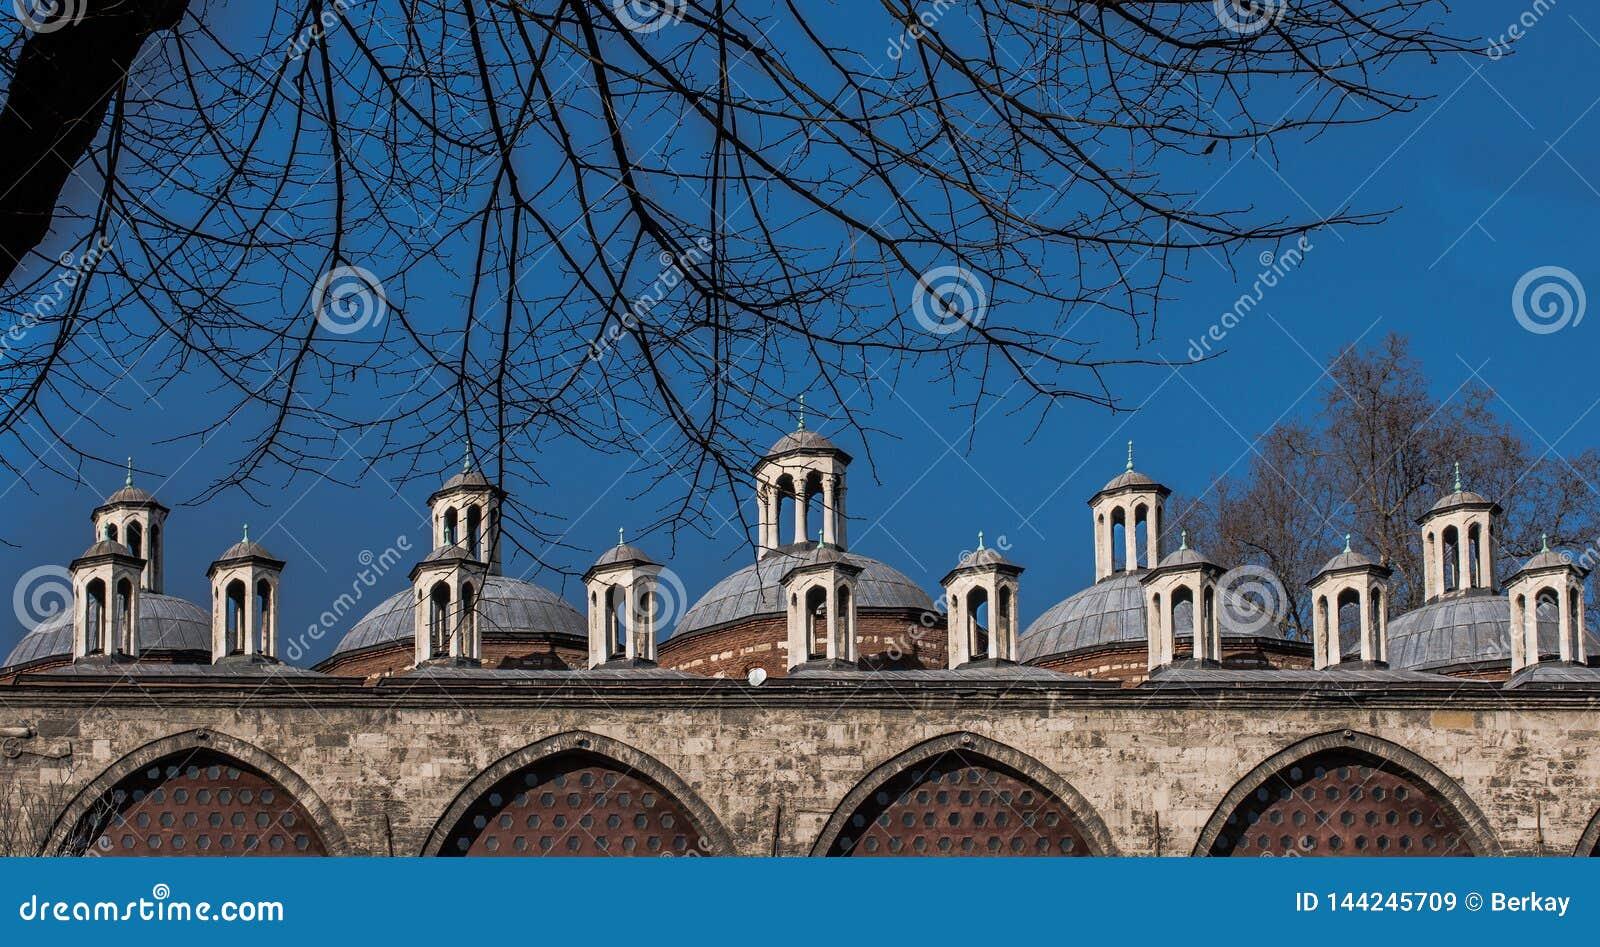 Fine example of ottoman Turkish architecture fragments